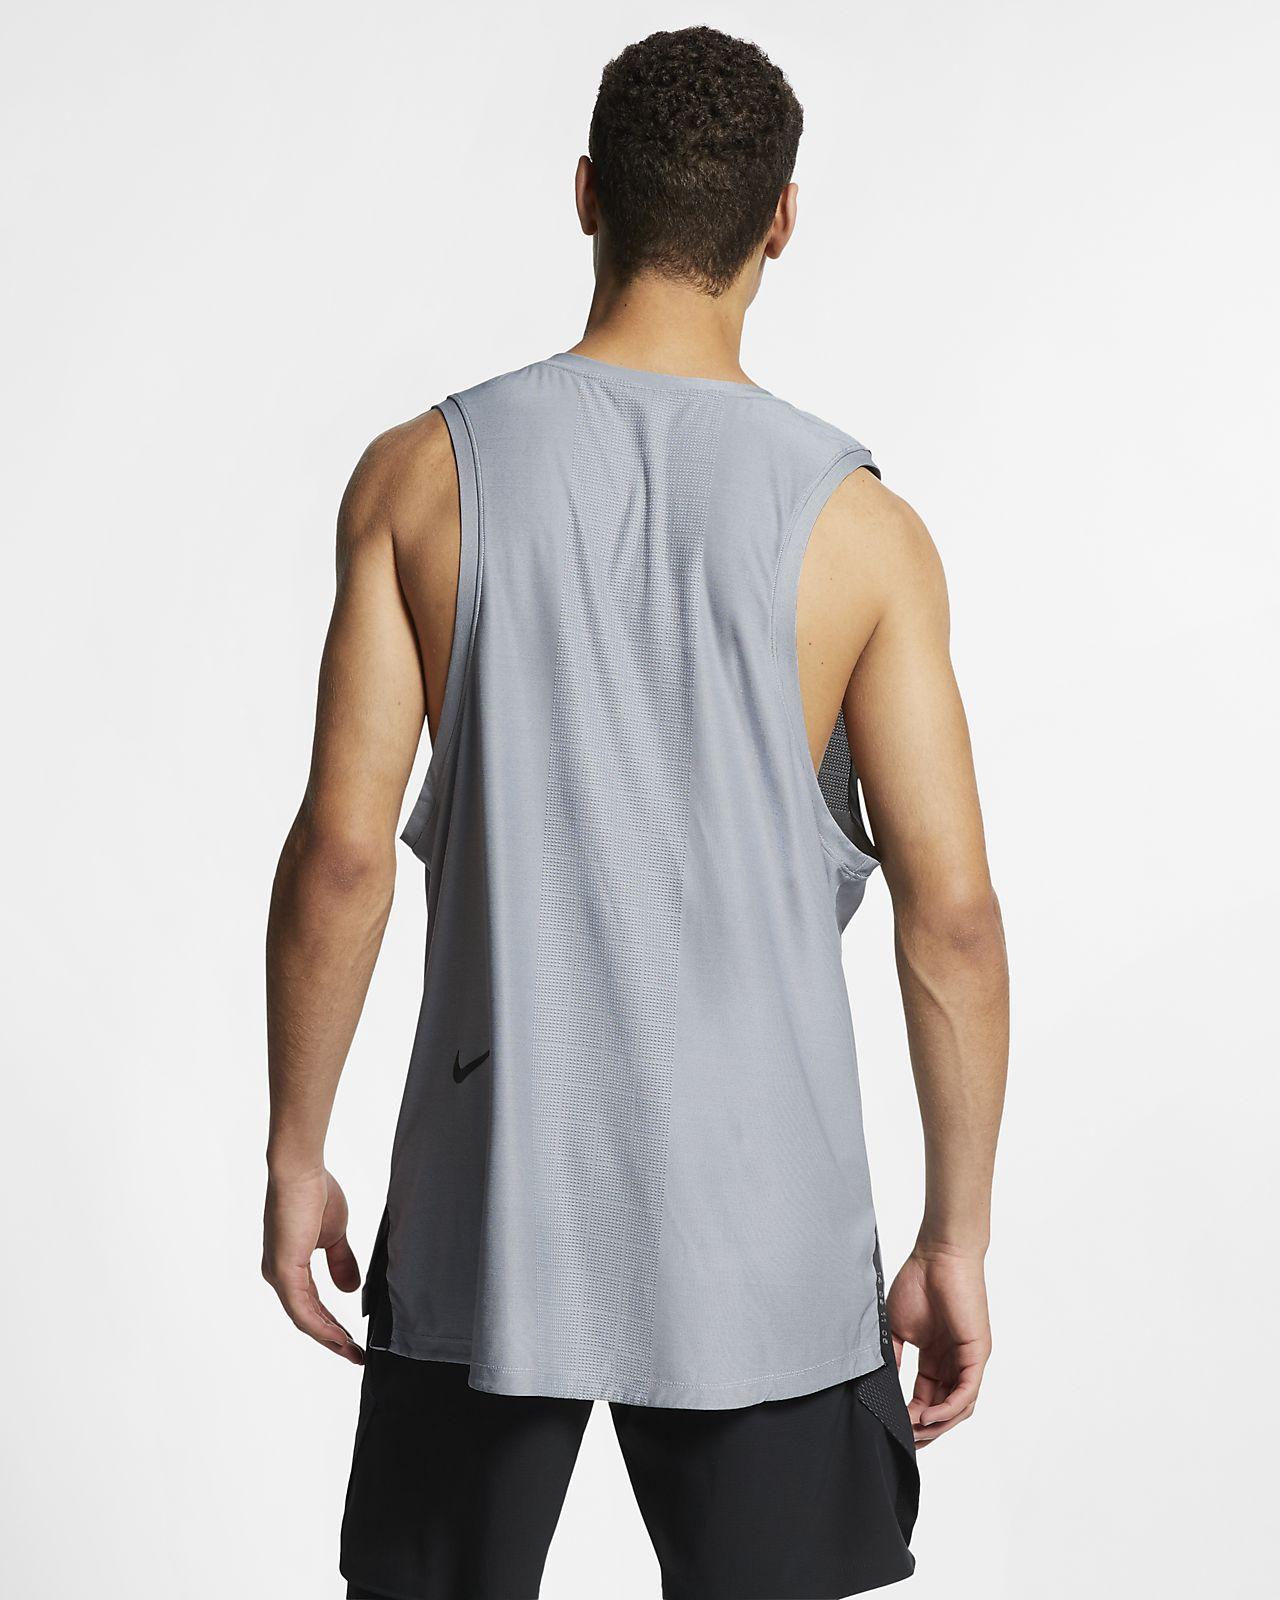 51d2c354daf8c5 Clothing